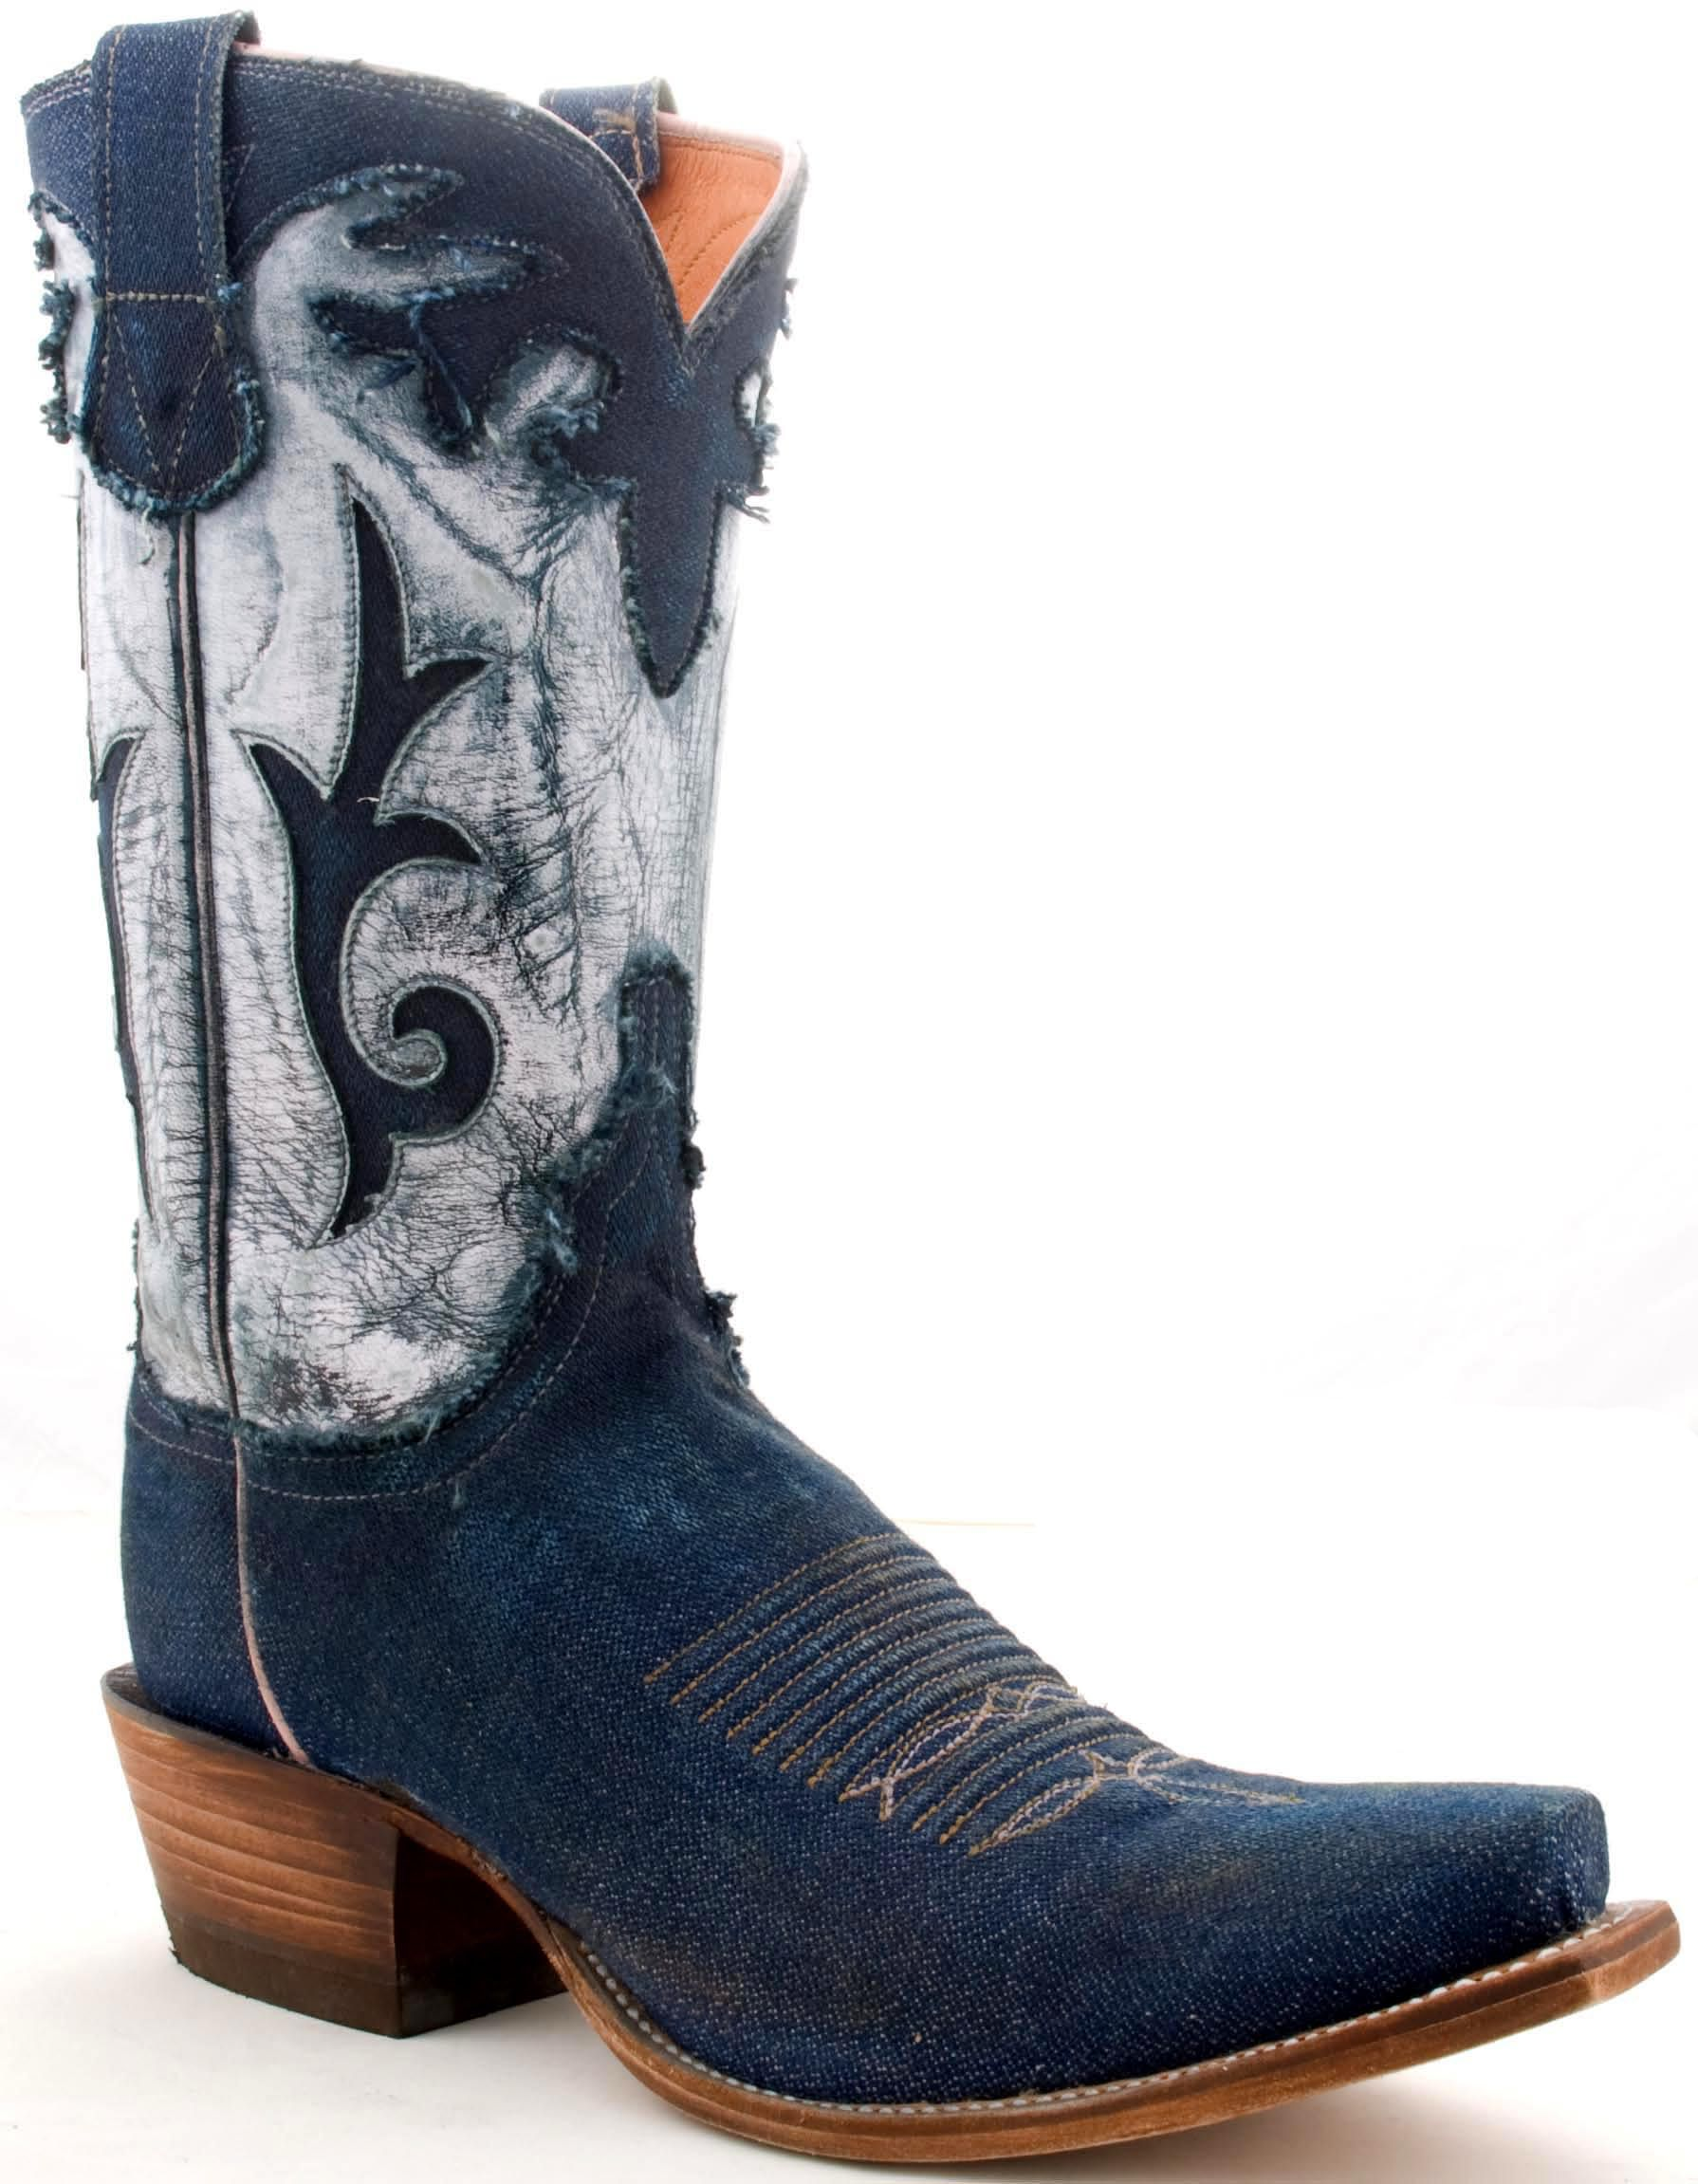 Stonewashed Denim Cowboy Boots